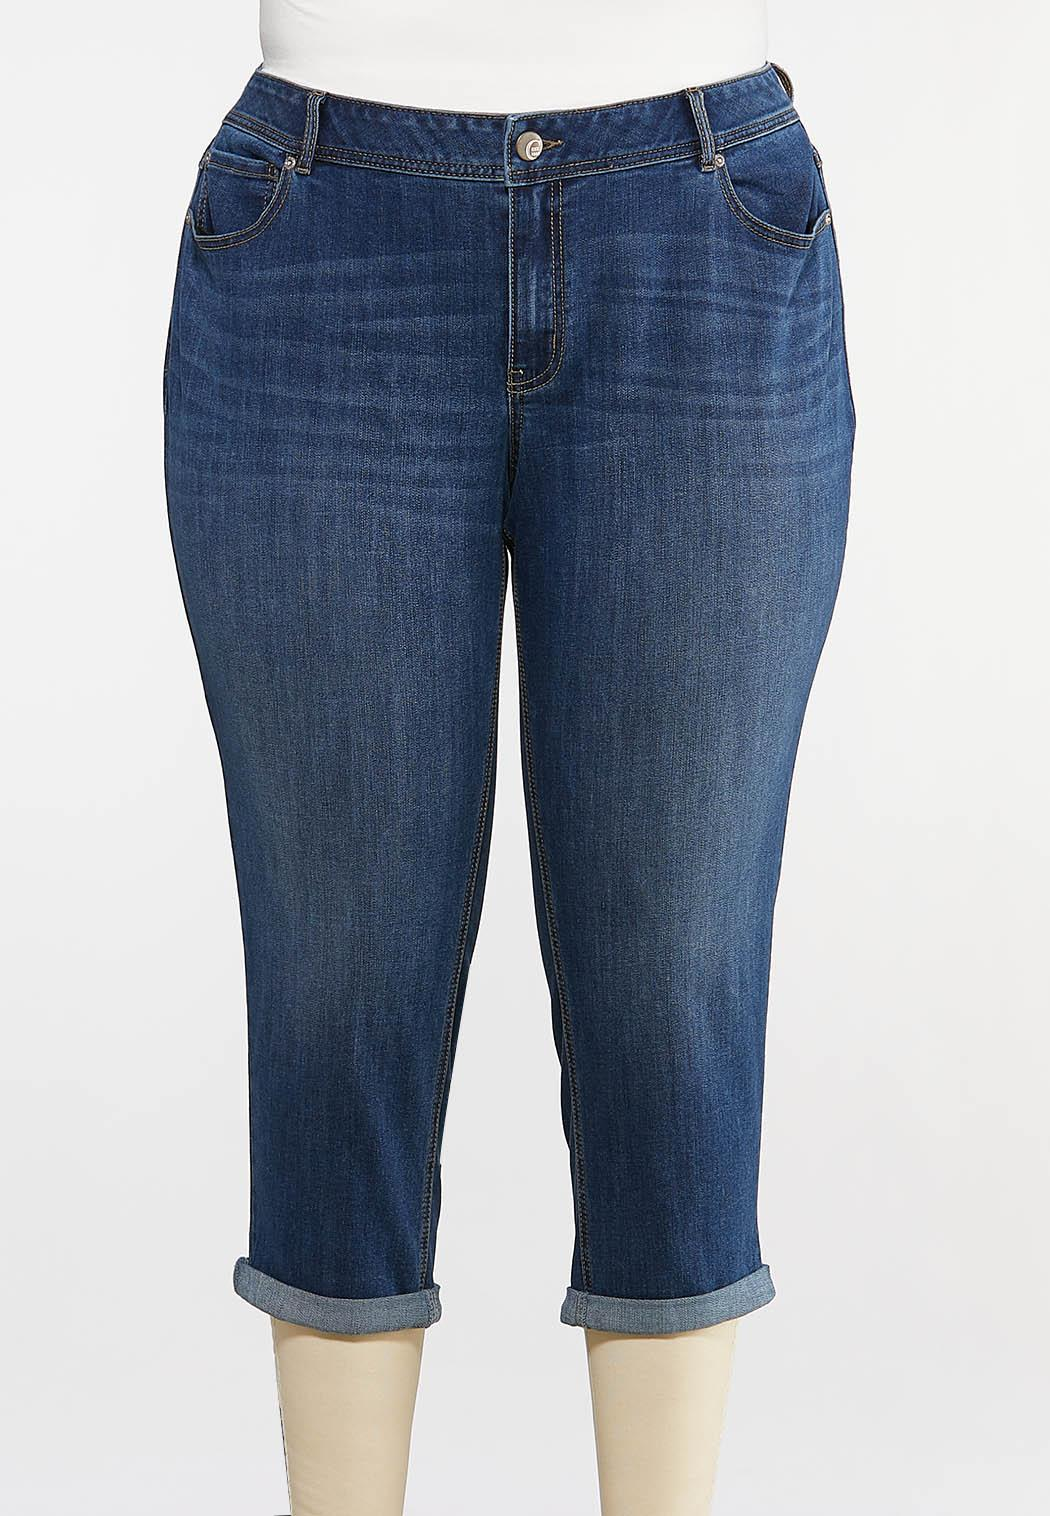 CATO Premium Jeans 22WP Classic Skinny Leg Petite Uplifting